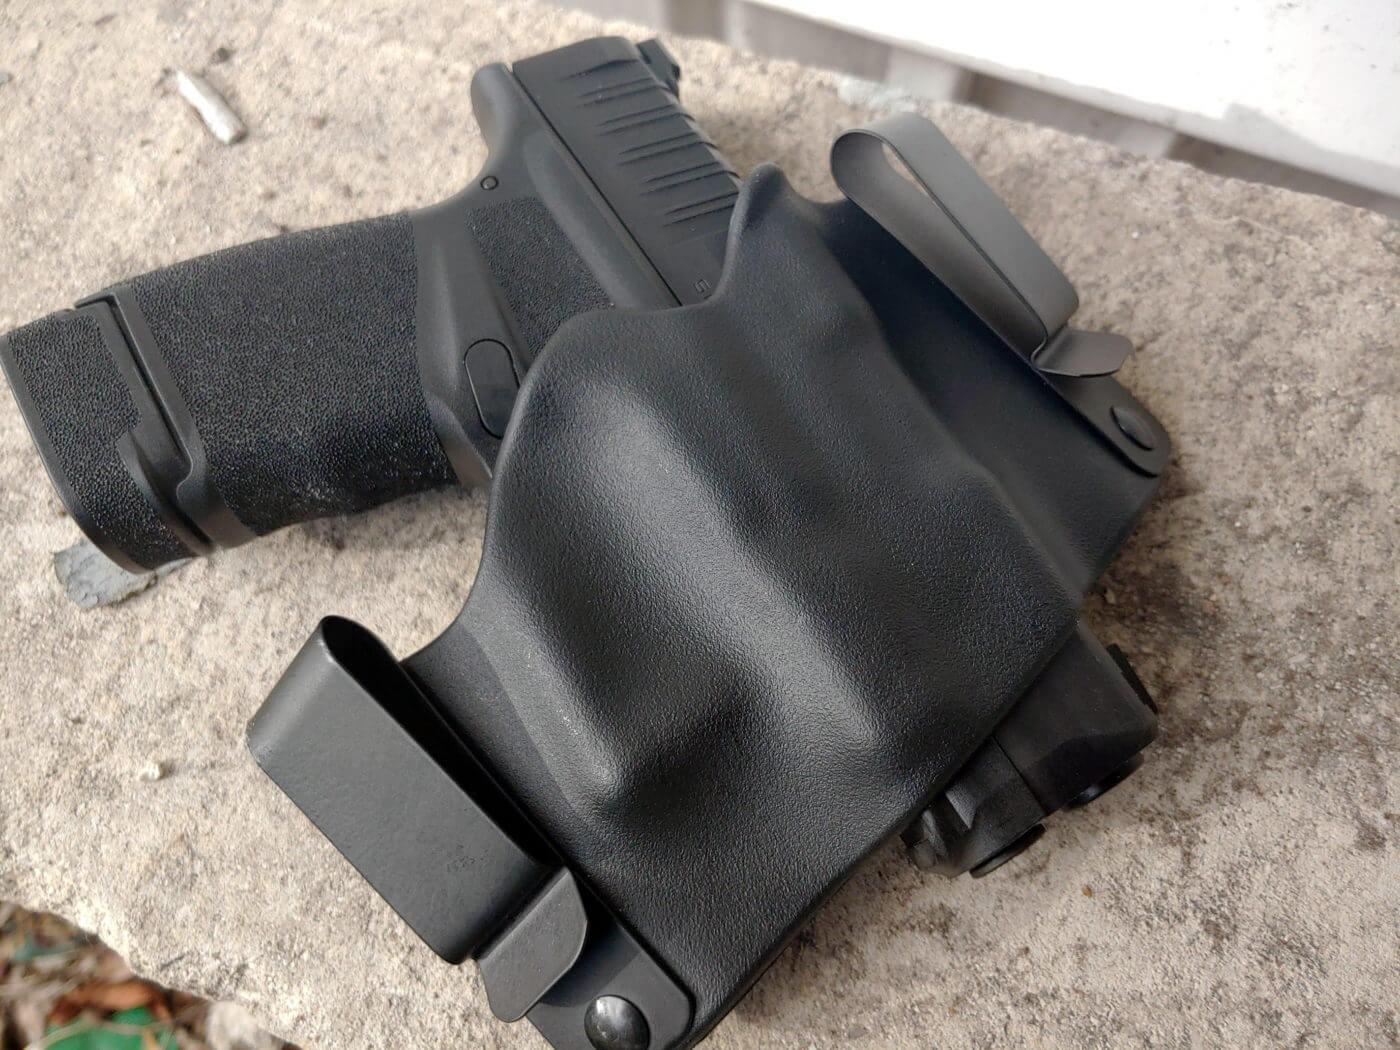 A Phalanx holster for the Hellcat pistol